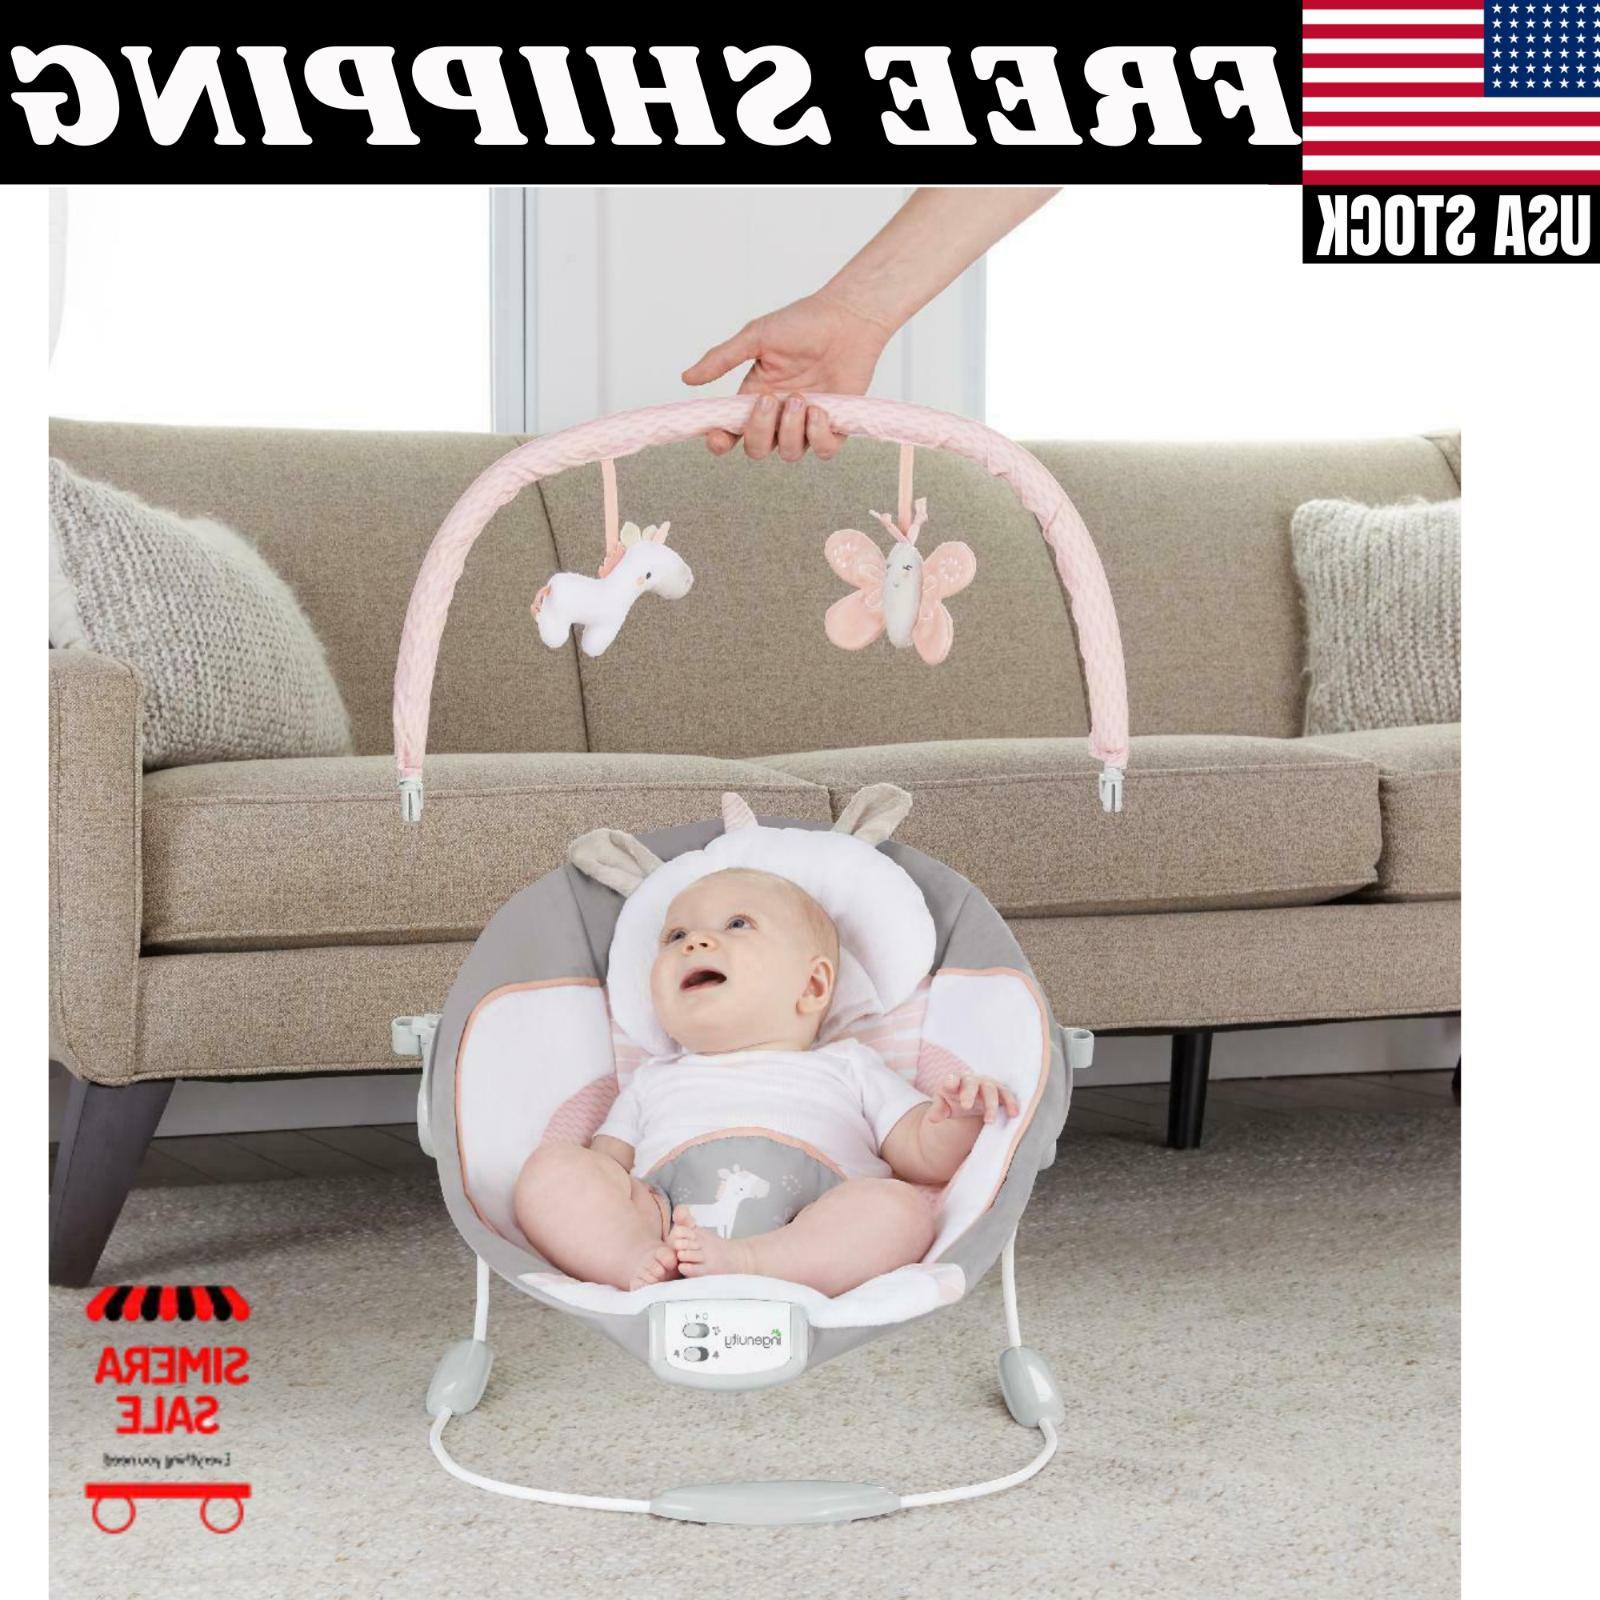 Cradling Bouncer - Seat Baby